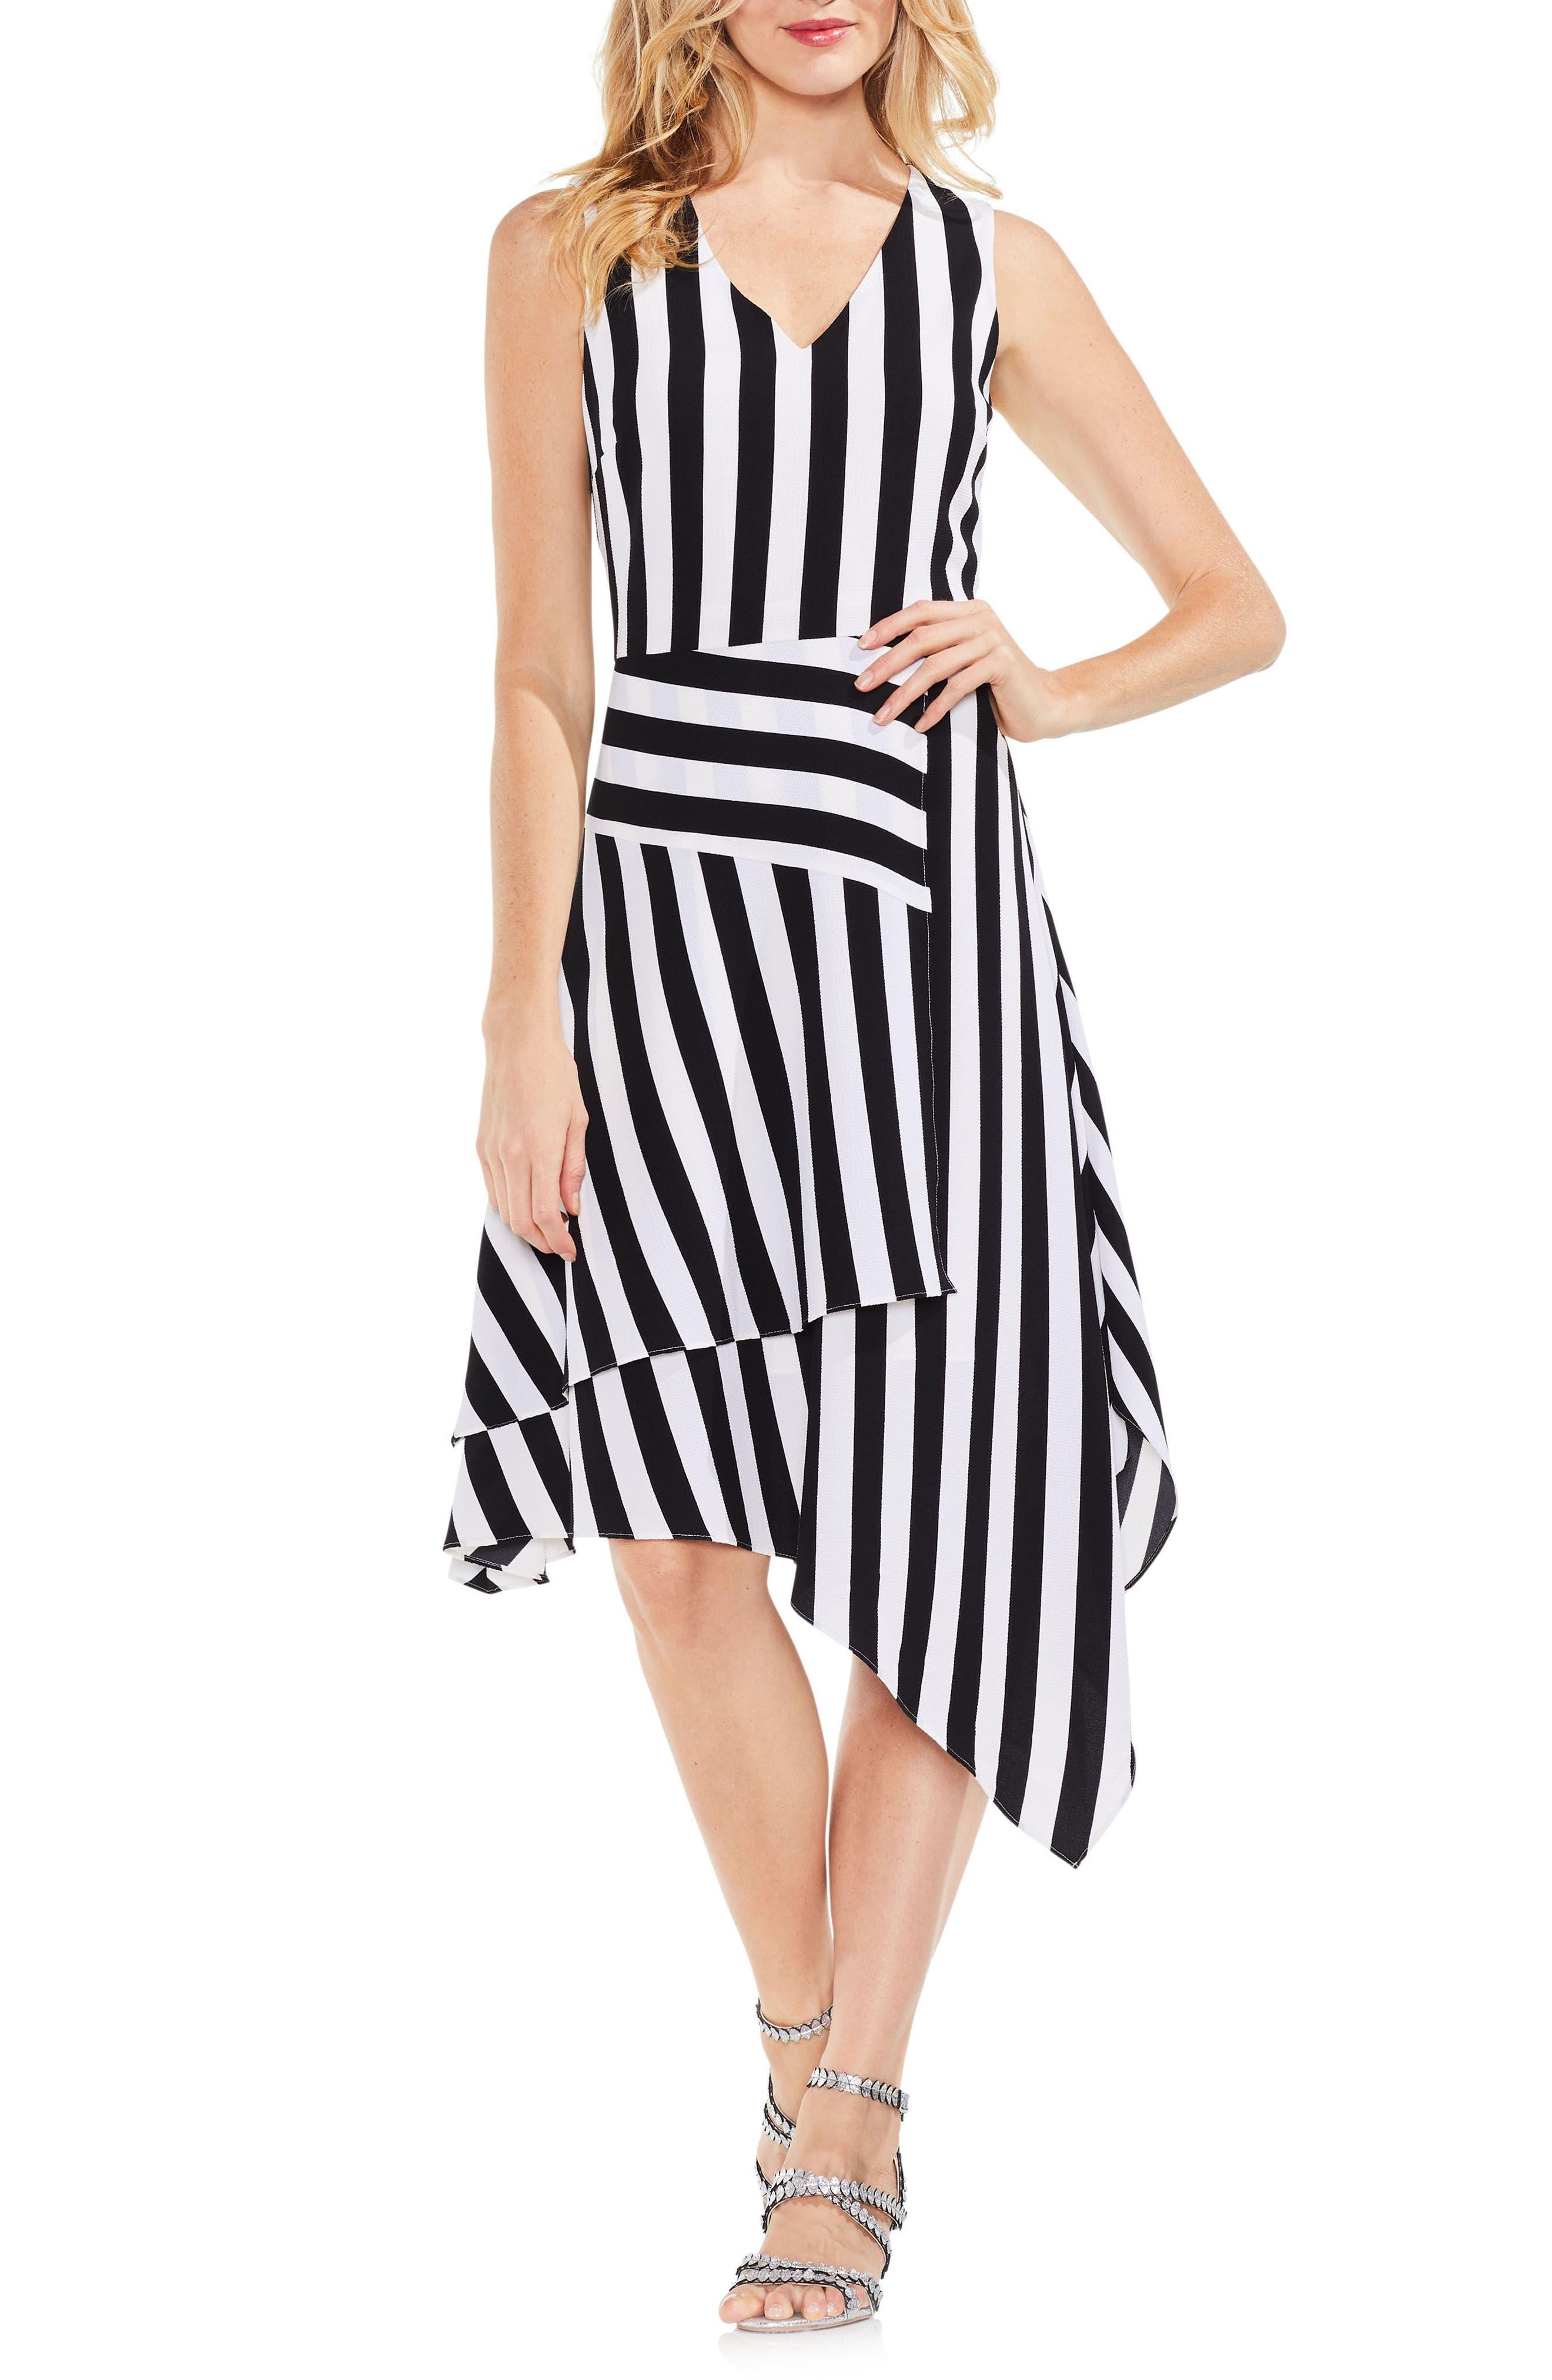 Alternate Image 1 Selected - Vince Camuto Spectator Stripe Asymmetrical Hem Dress